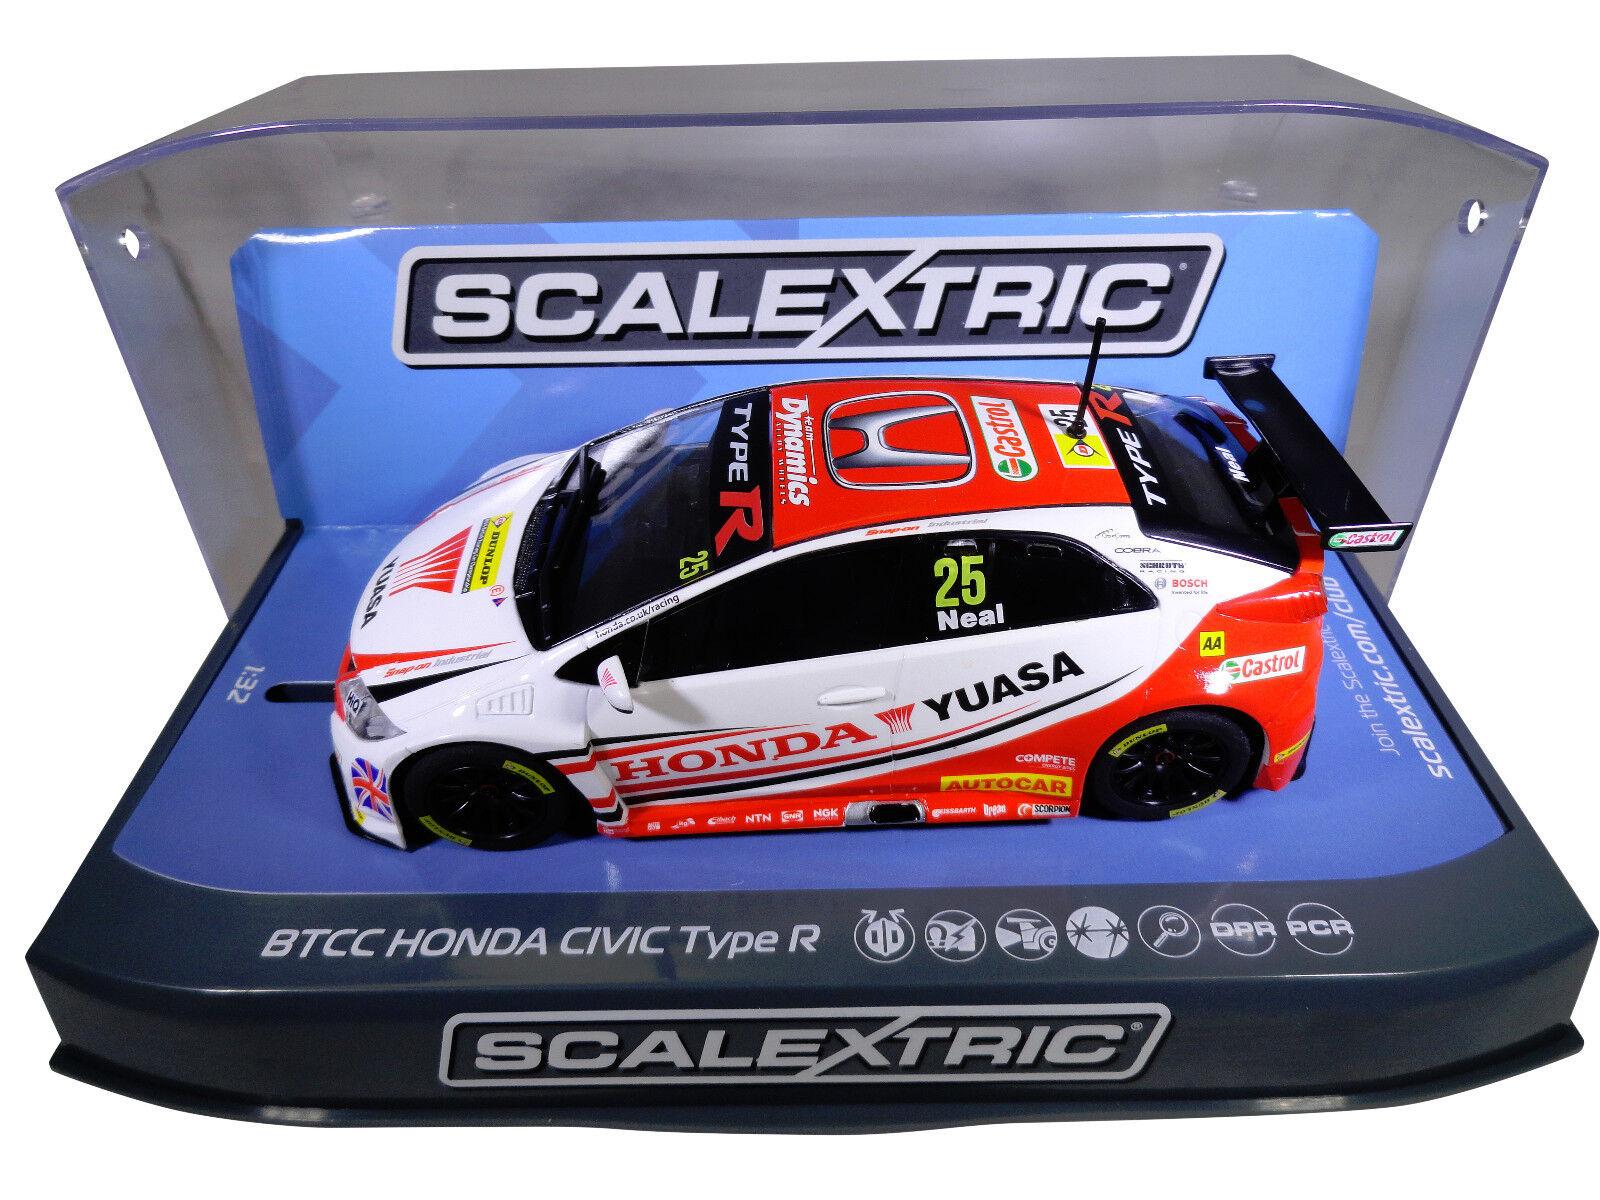 Scalextric  Yuasa  BTCC Honda Civic PCR DPR W  Lights 1 32 Scale Slot Car C3734